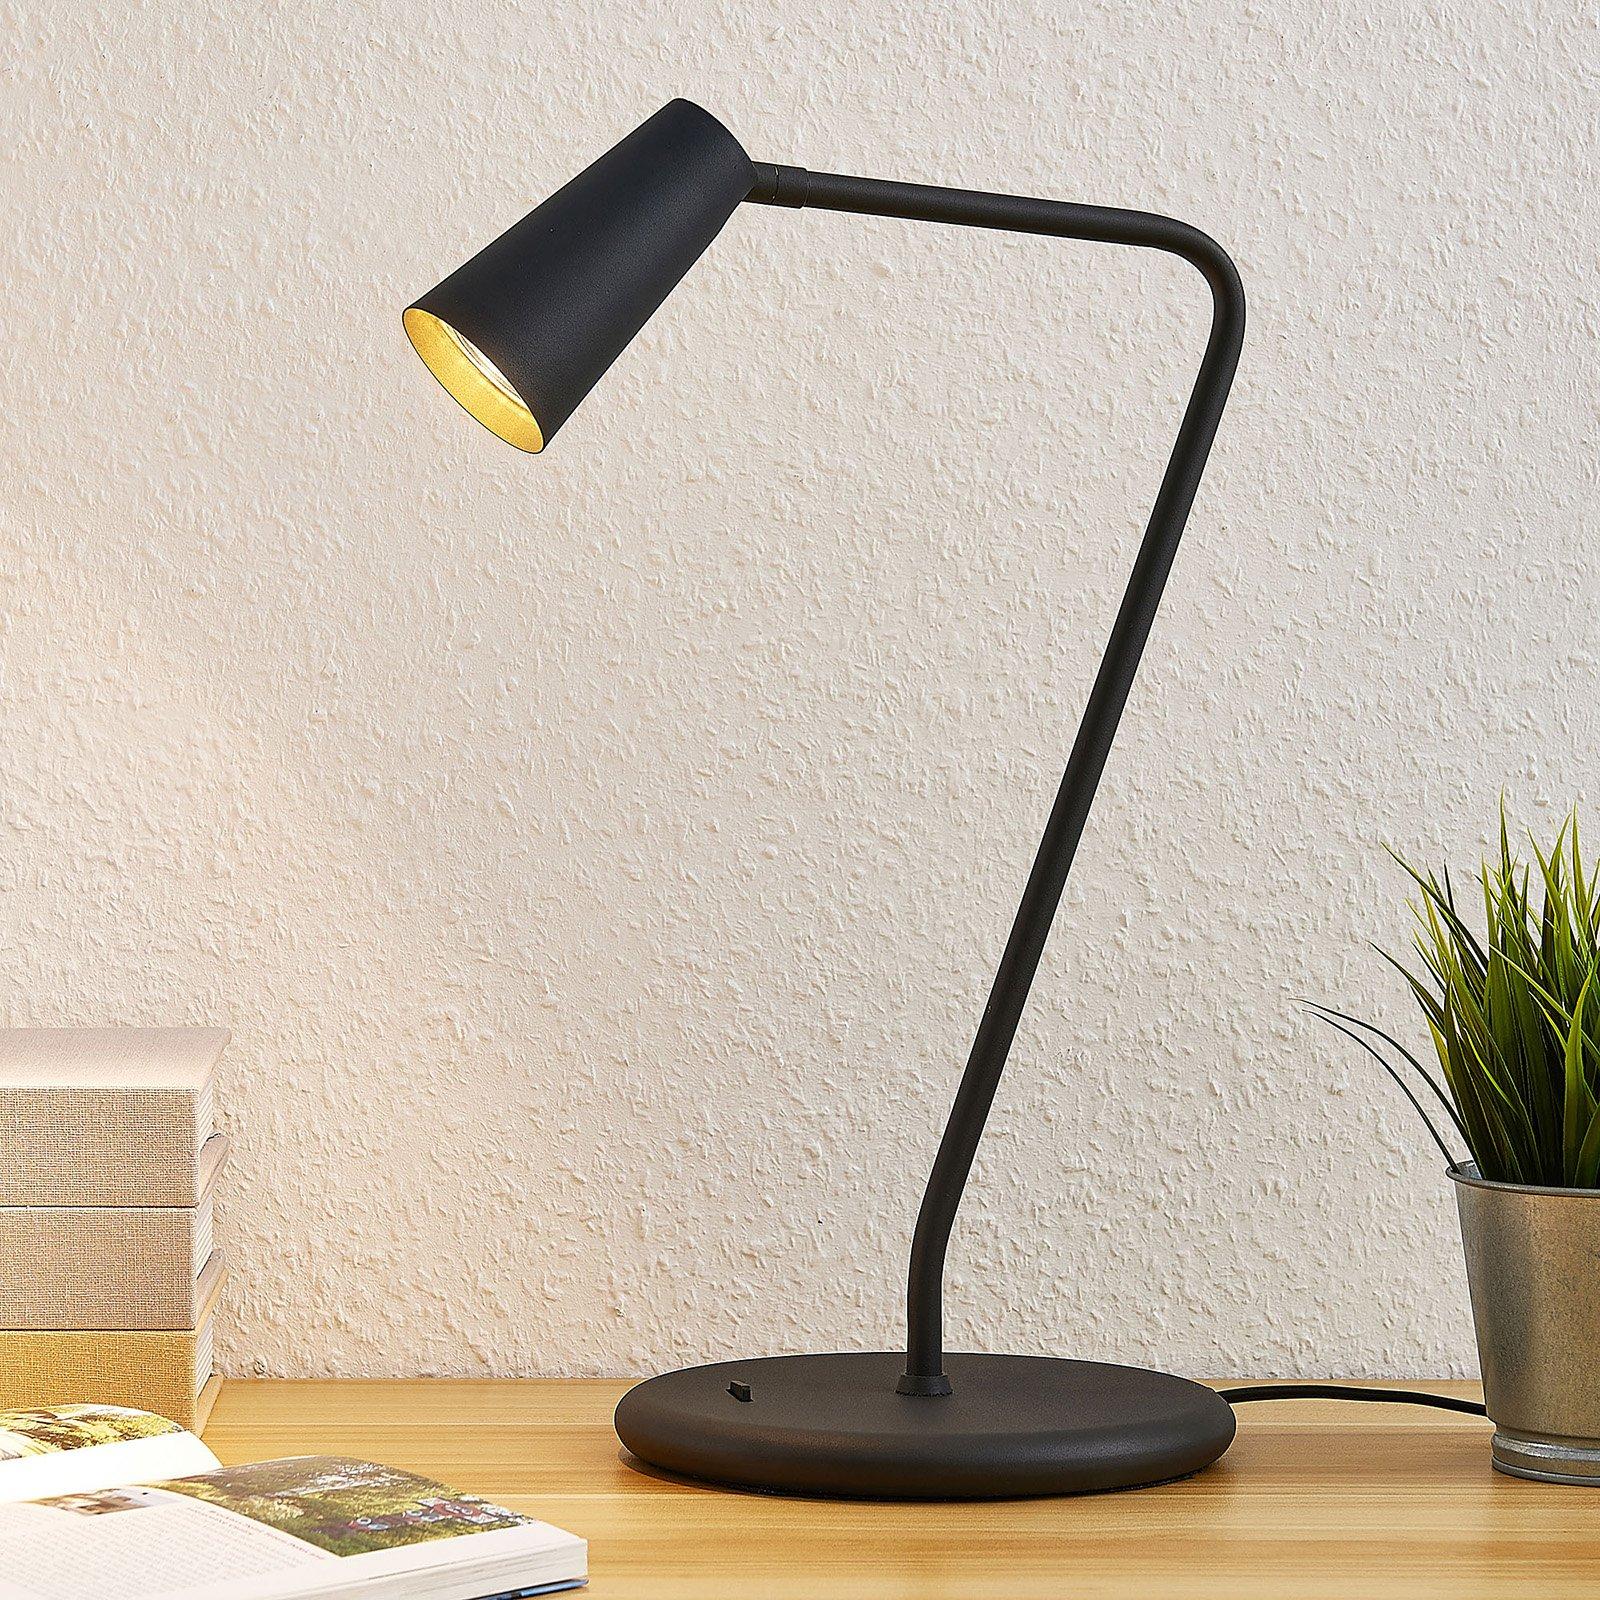 Lucande Angelina bordlampe, svart-gull